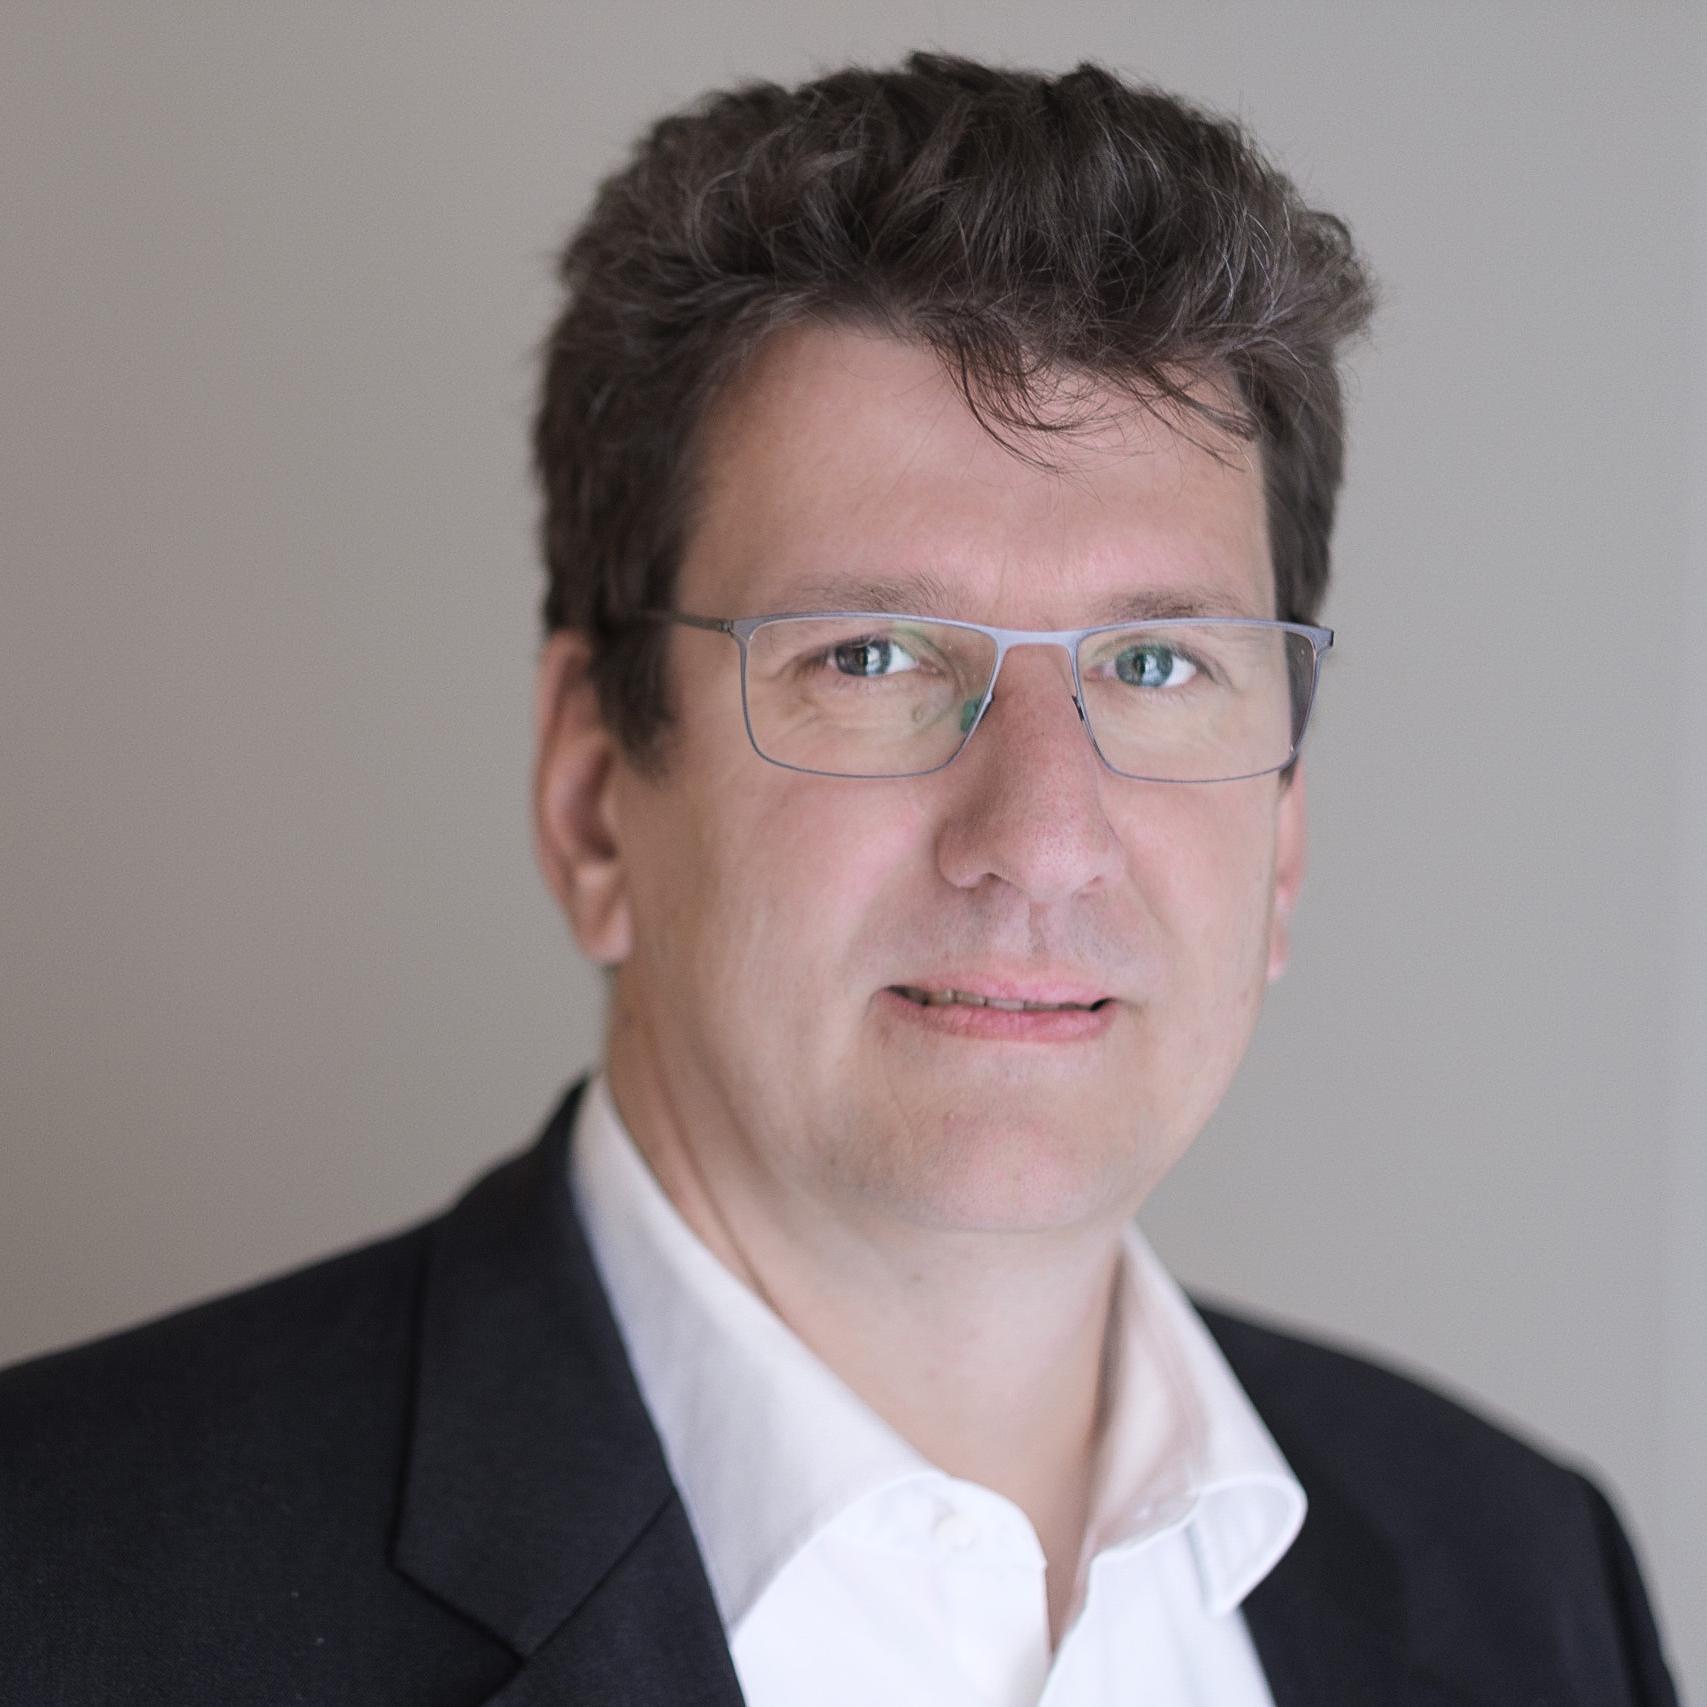 Prof. Dr. Peter Fromm, University of Applied Sciences Darmstadt